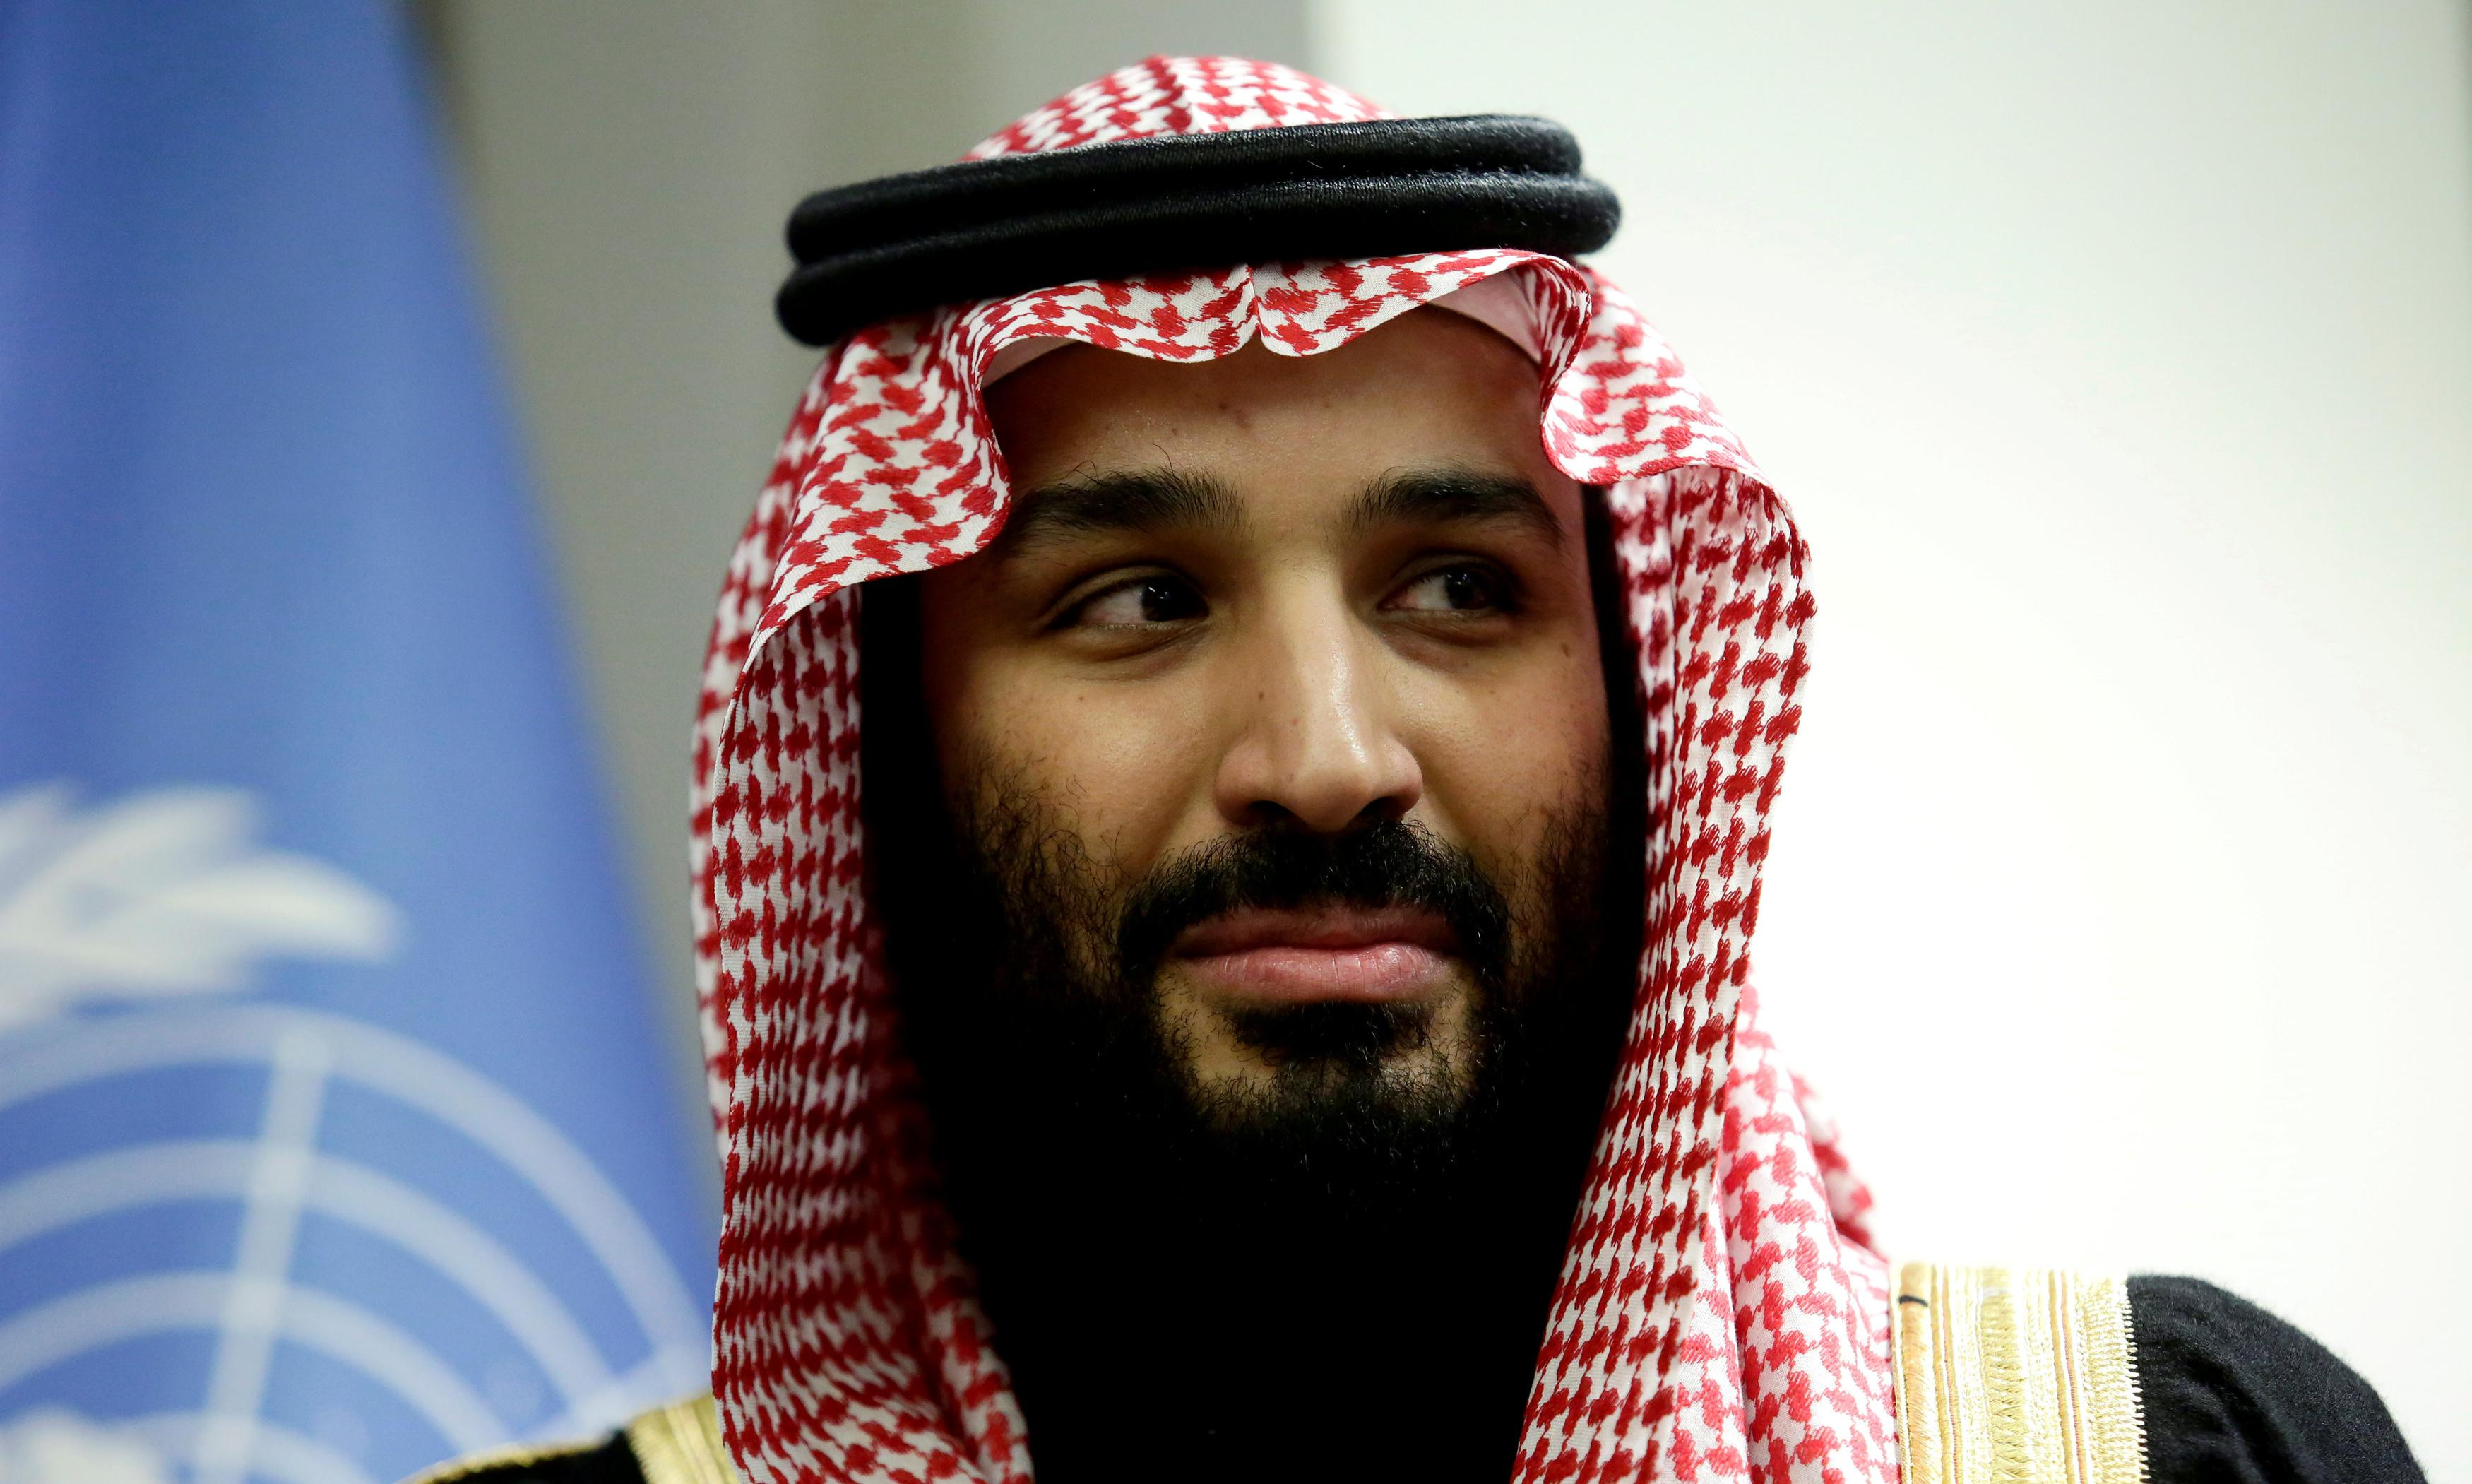 Crown Prince's wings clipped as Khashoggi death rattles Riyadh